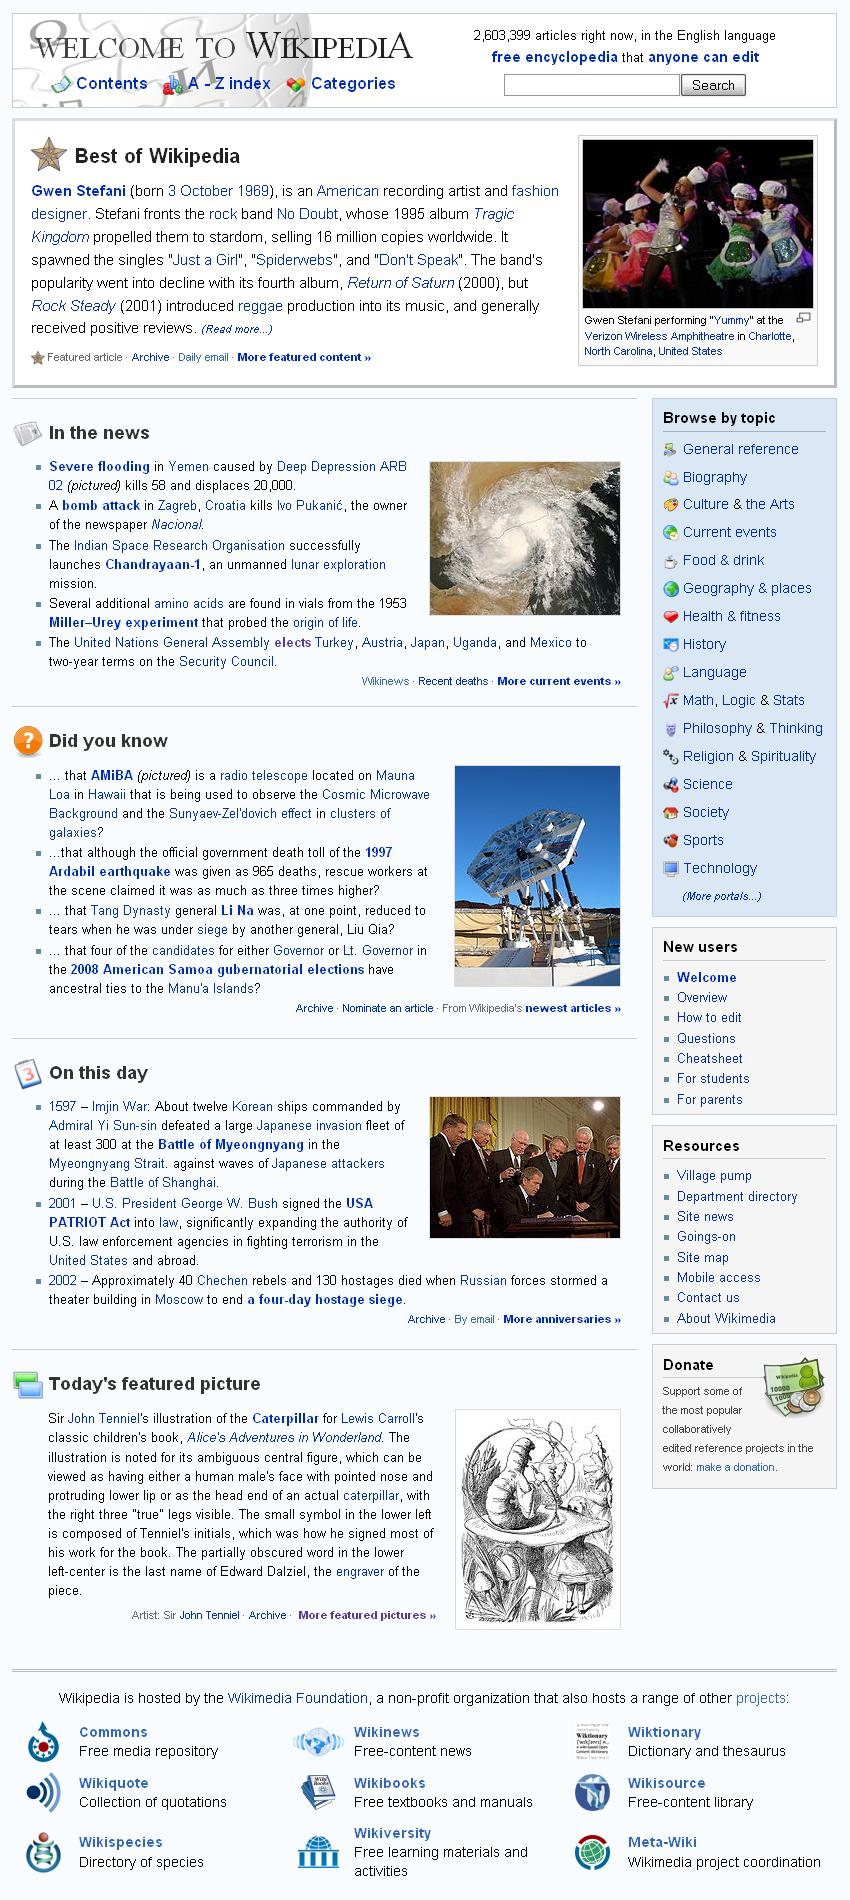 online dating websites wikipedia english